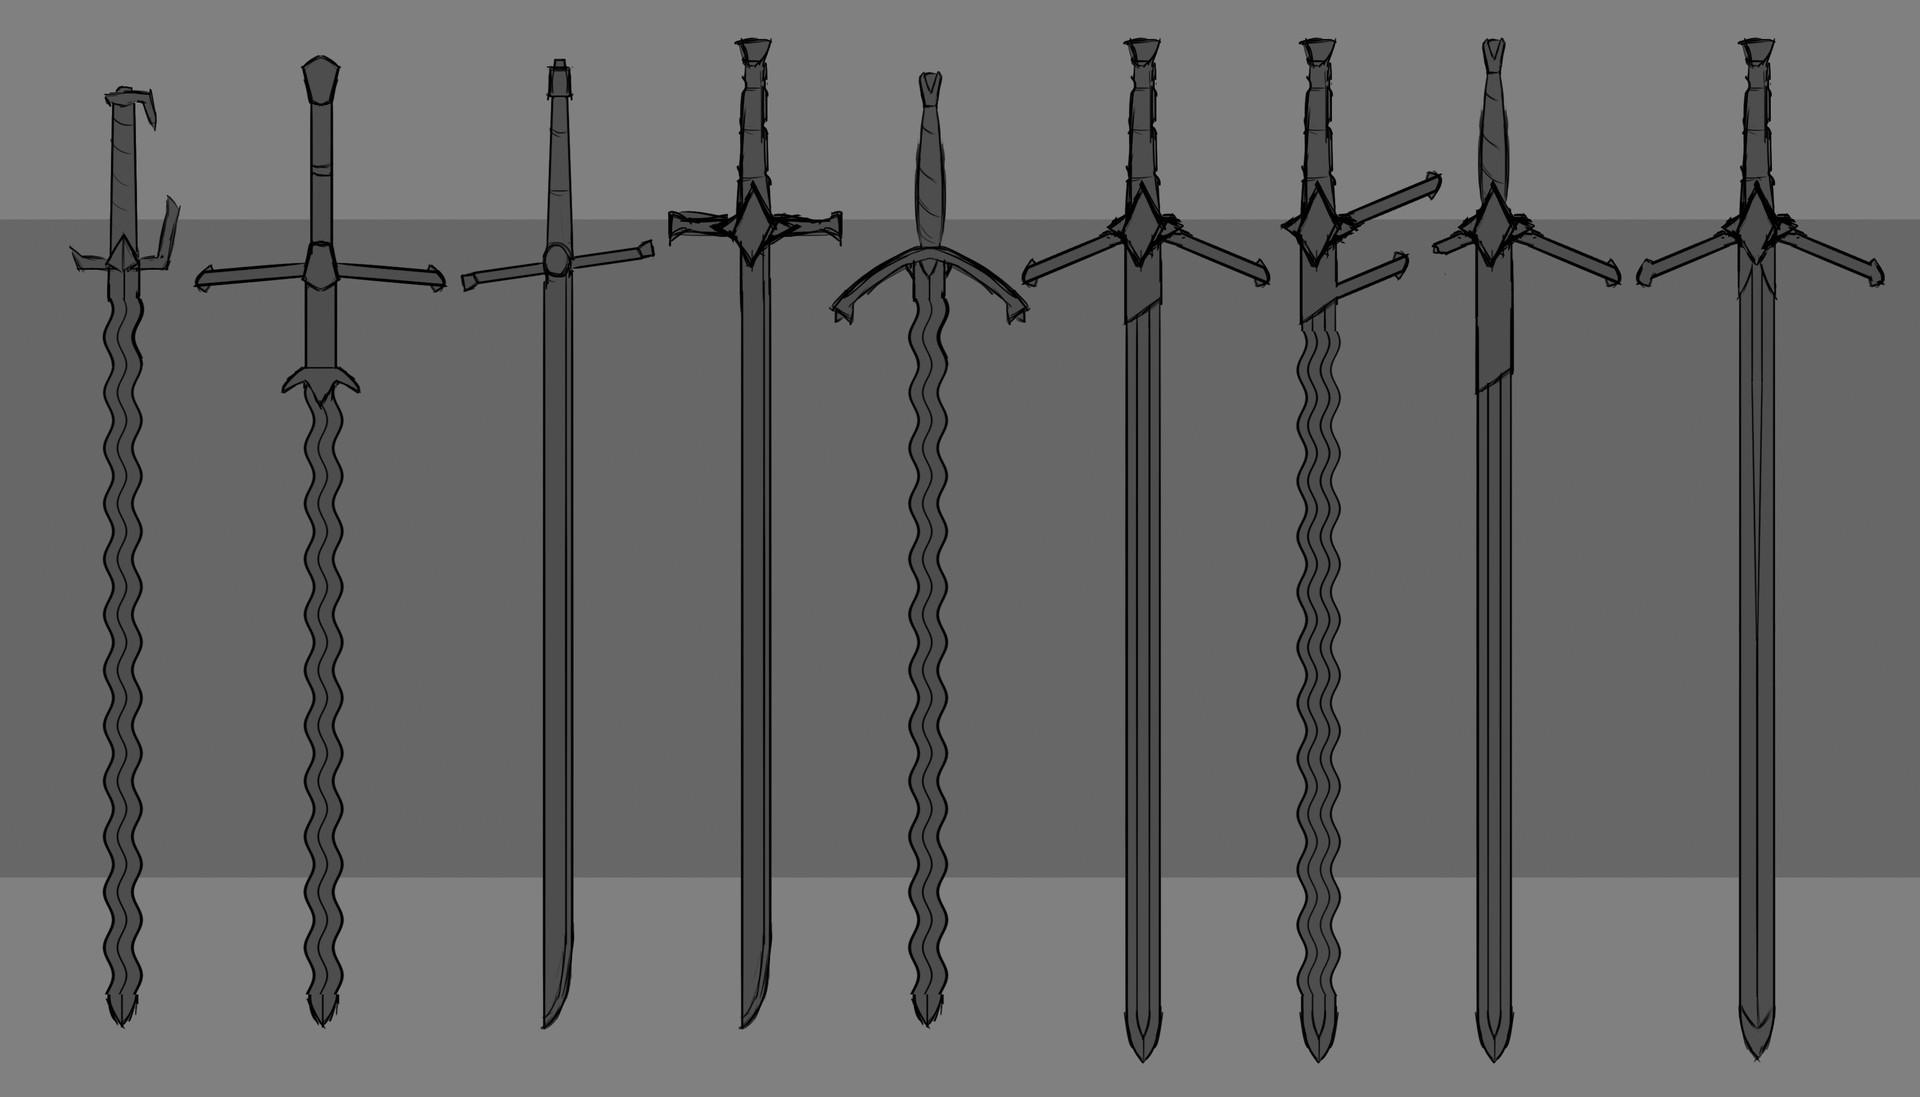 Hannah pallister 20170414 thea sword designs 2